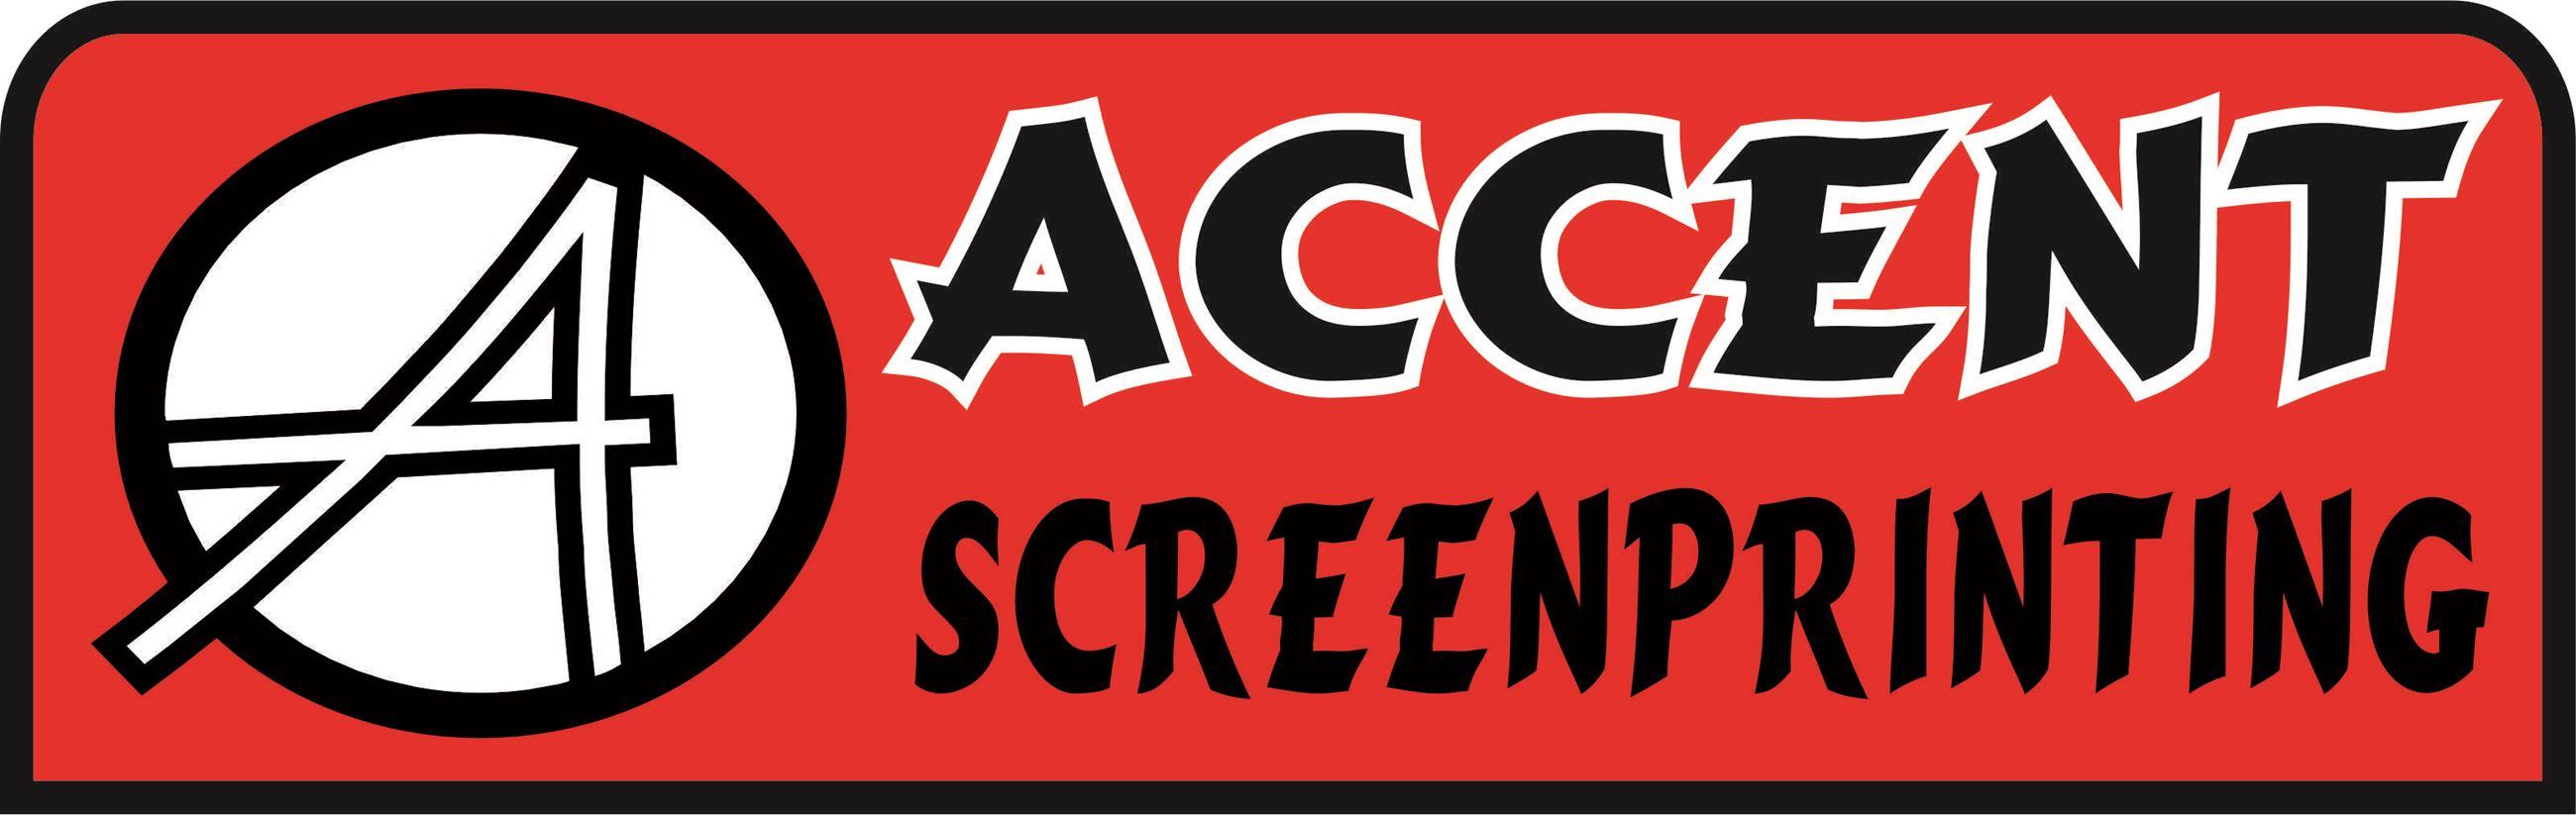 Accent Screenprinting